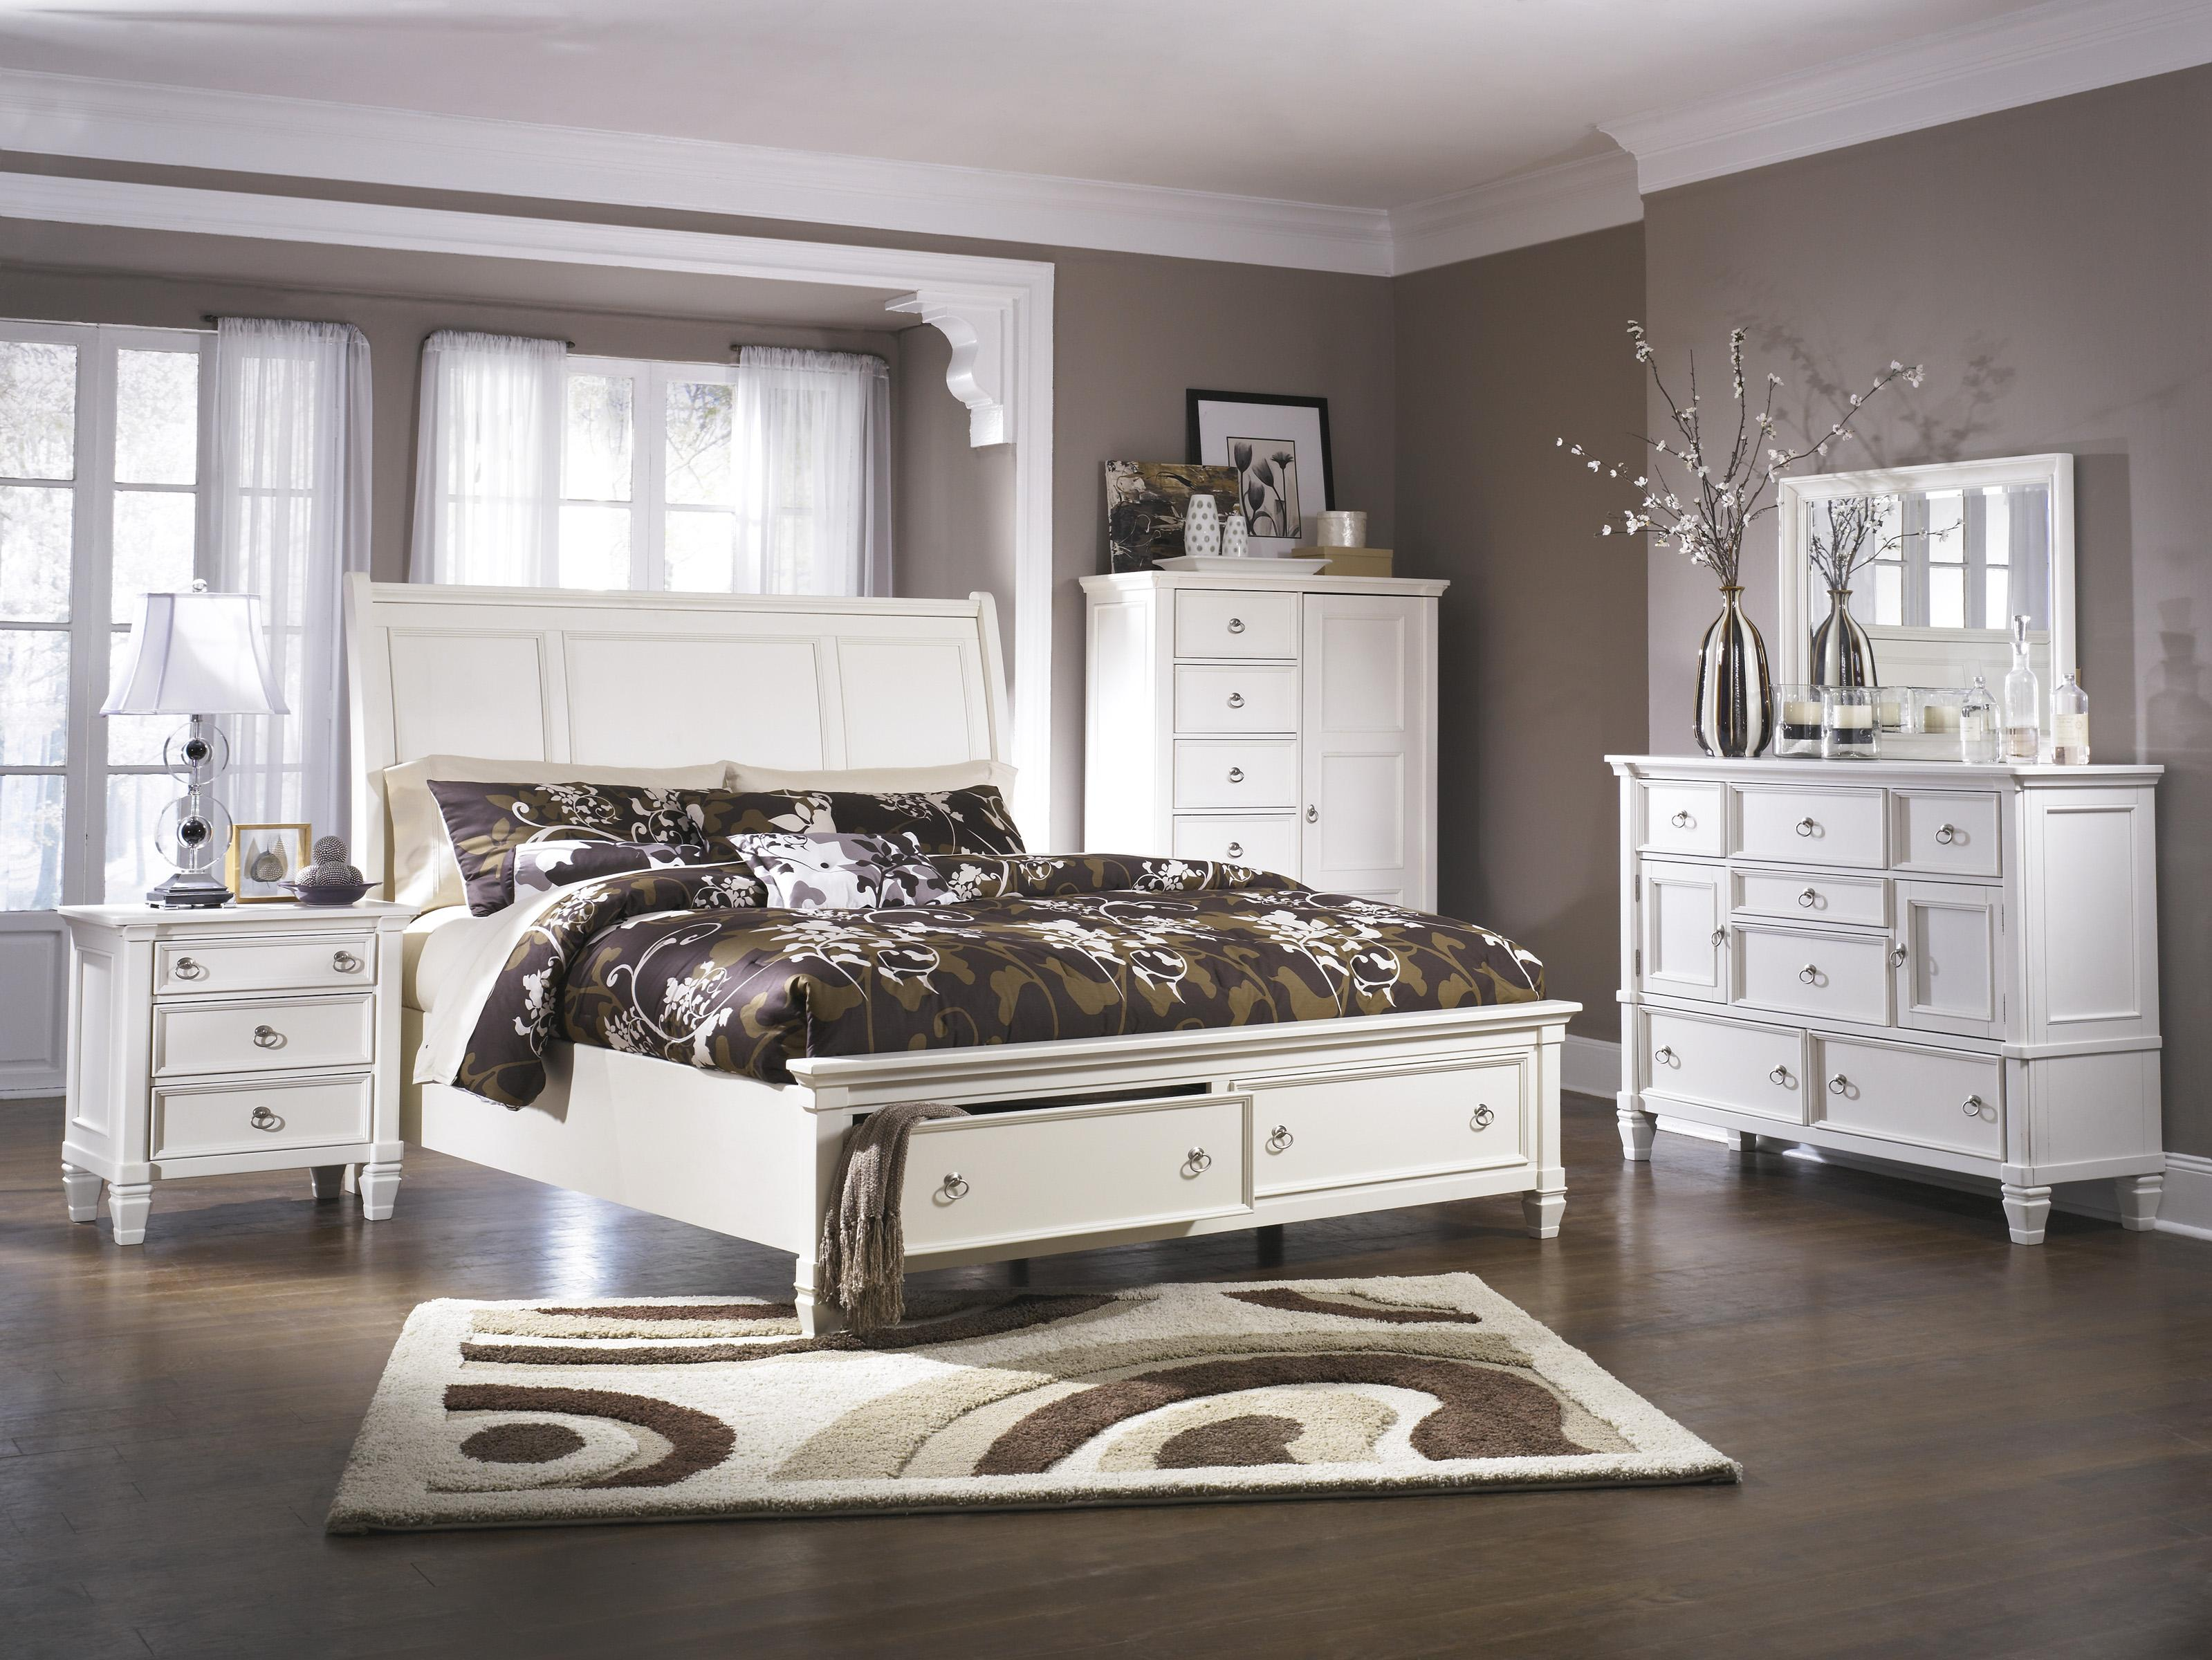 Prentice Queen Bedroom Group by Millennium at Northeast Factory Direct